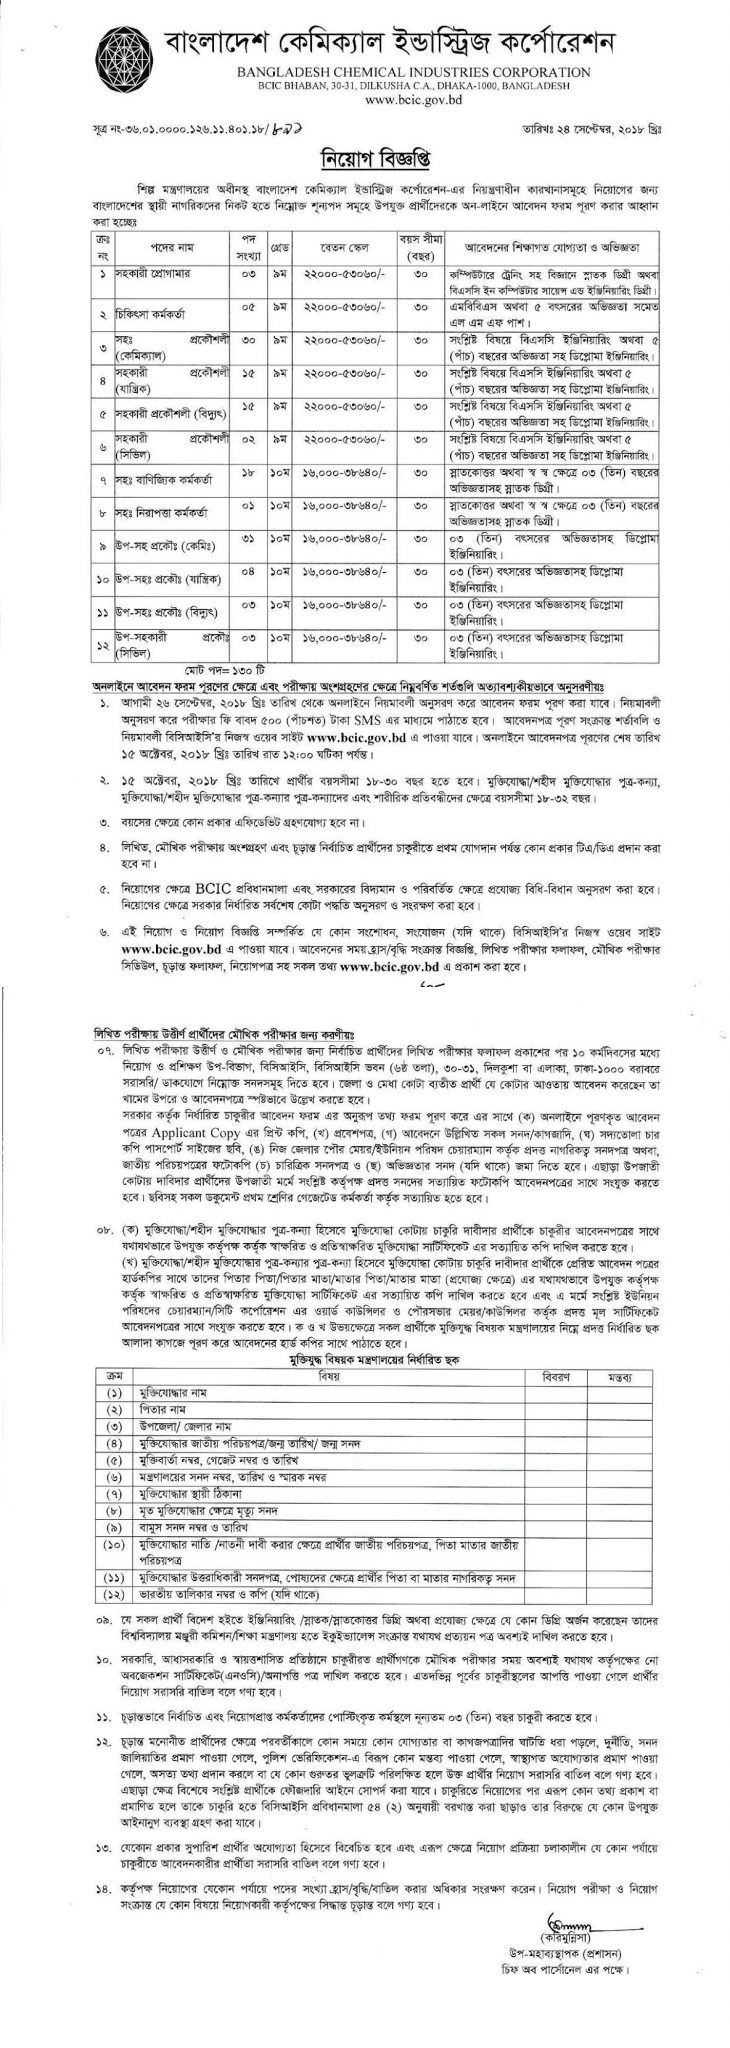 Bangladesh Chemical Industries Corporation job circular 2018